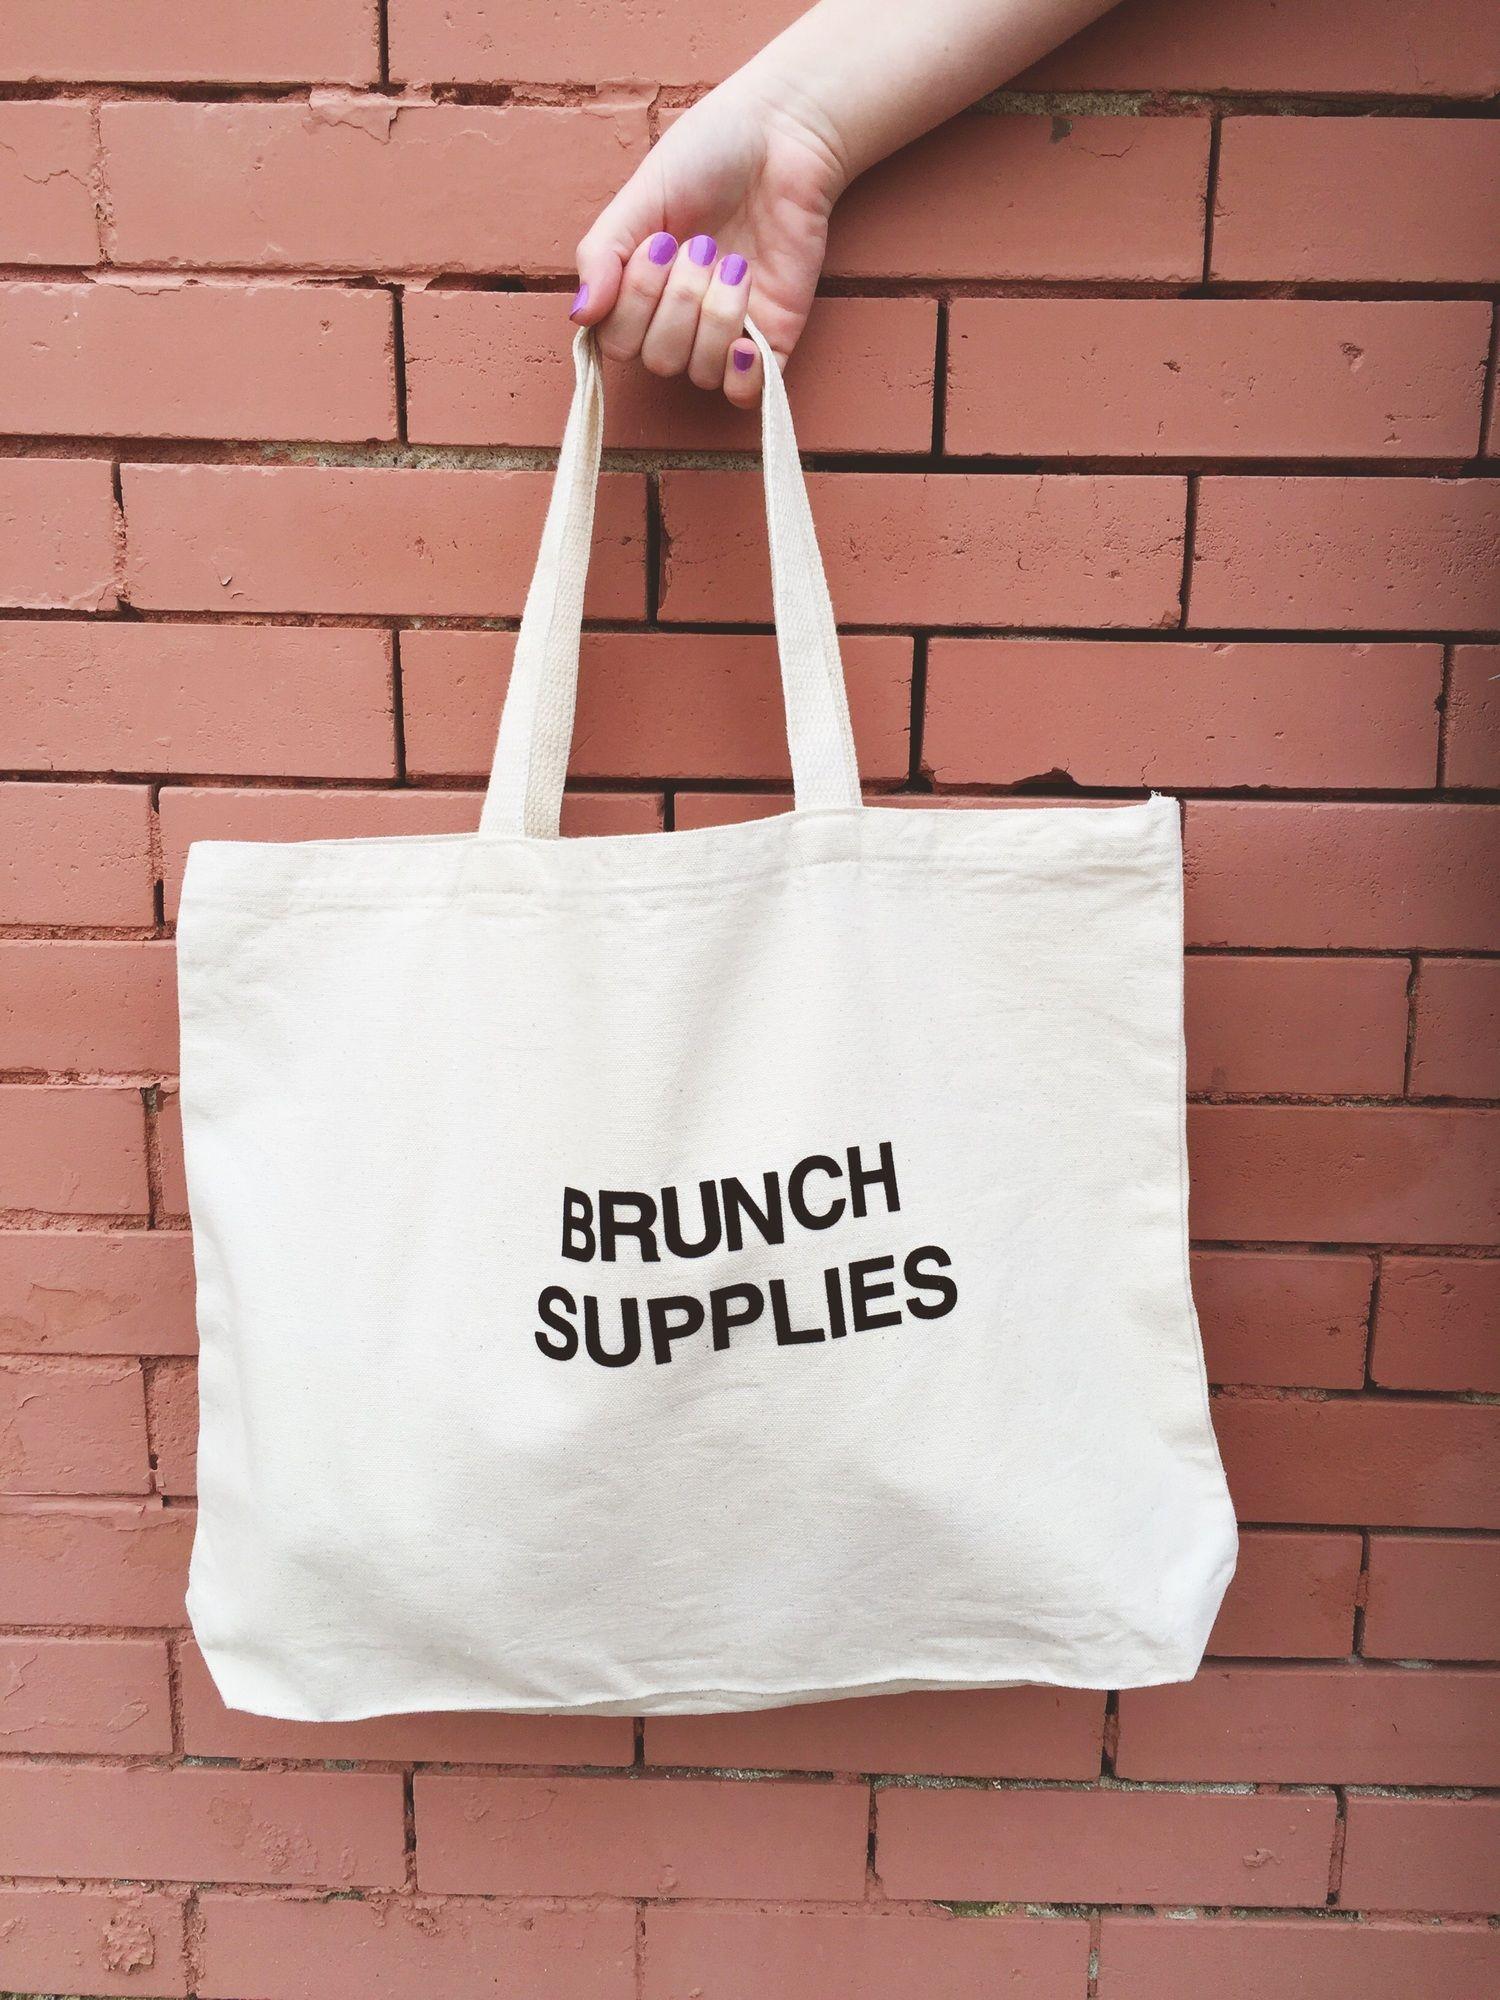 best 25 reusable shopping bags ideas on pinterest shopping bags folding shopping bags and. Black Bedroom Furniture Sets. Home Design Ideas